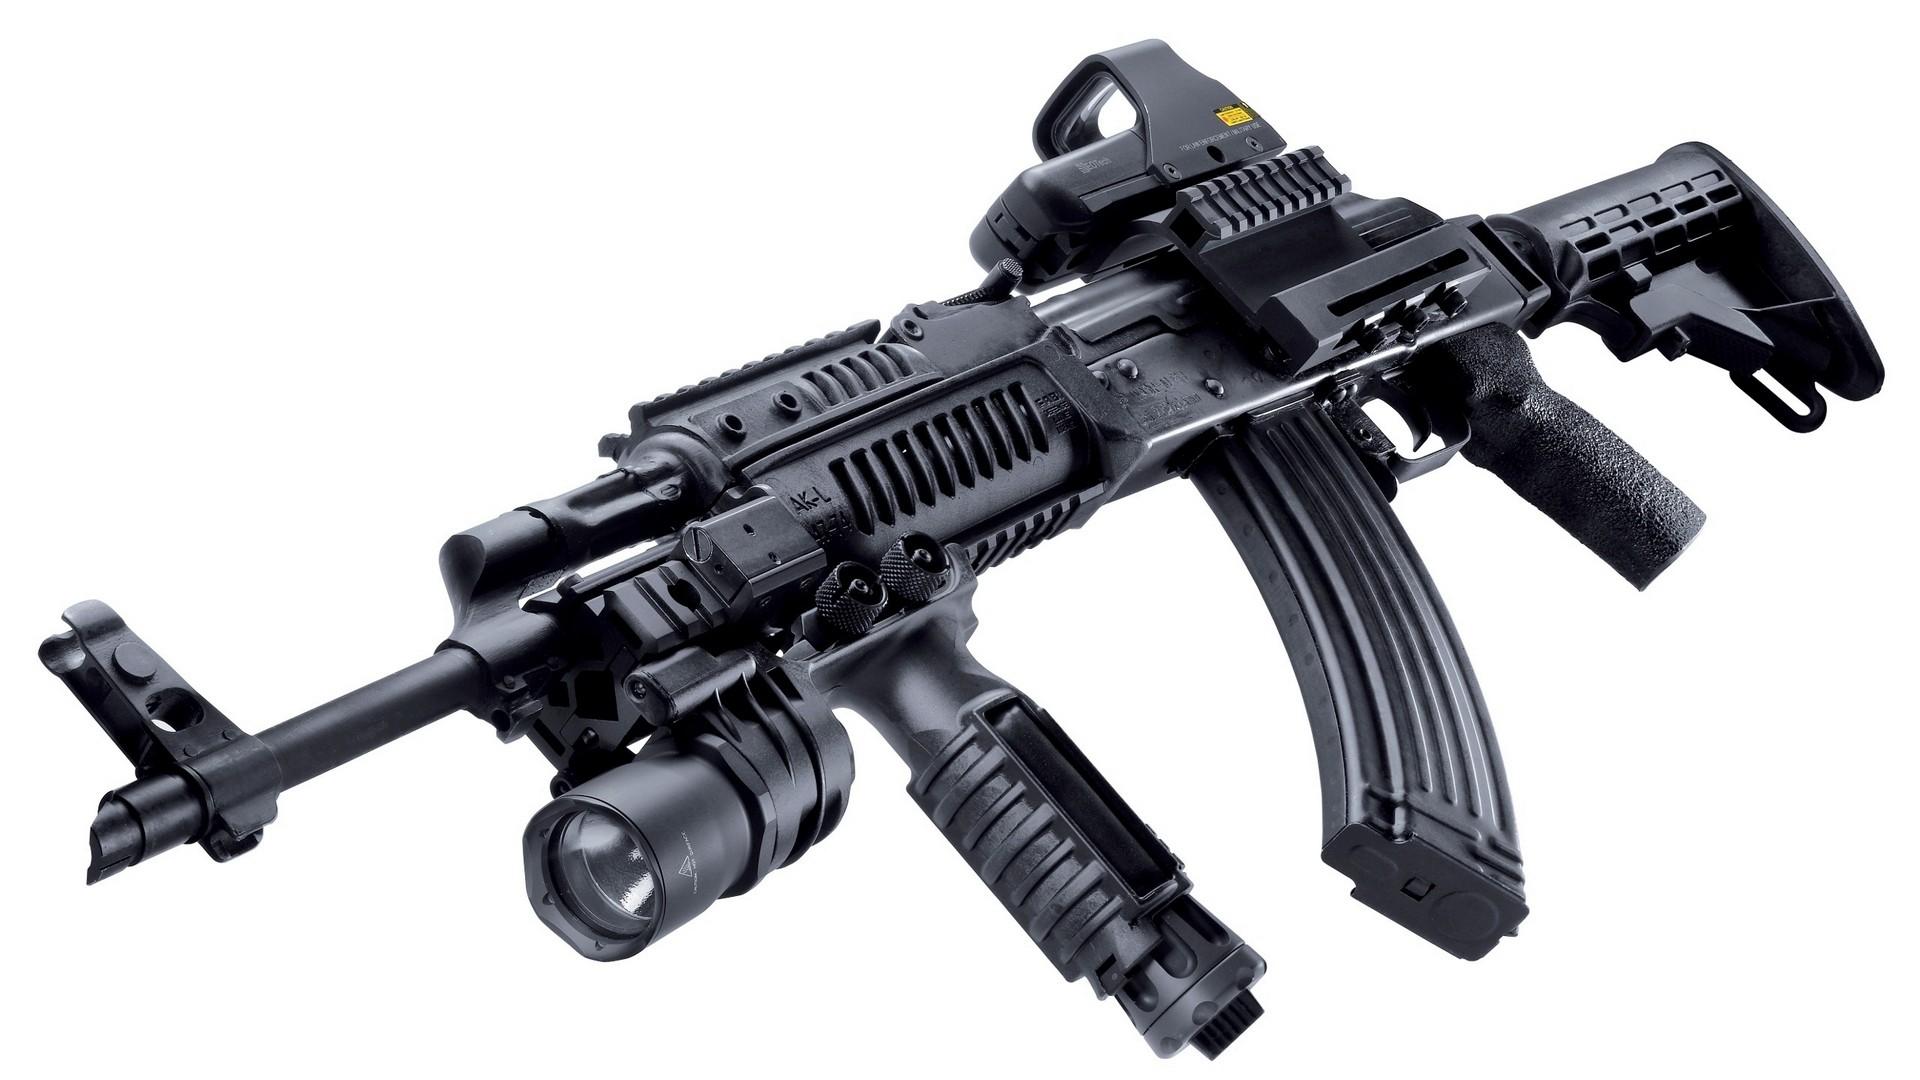 Download Machine Gun Wallpaper 1920x1080 Wallpoper 349933 1920x1080